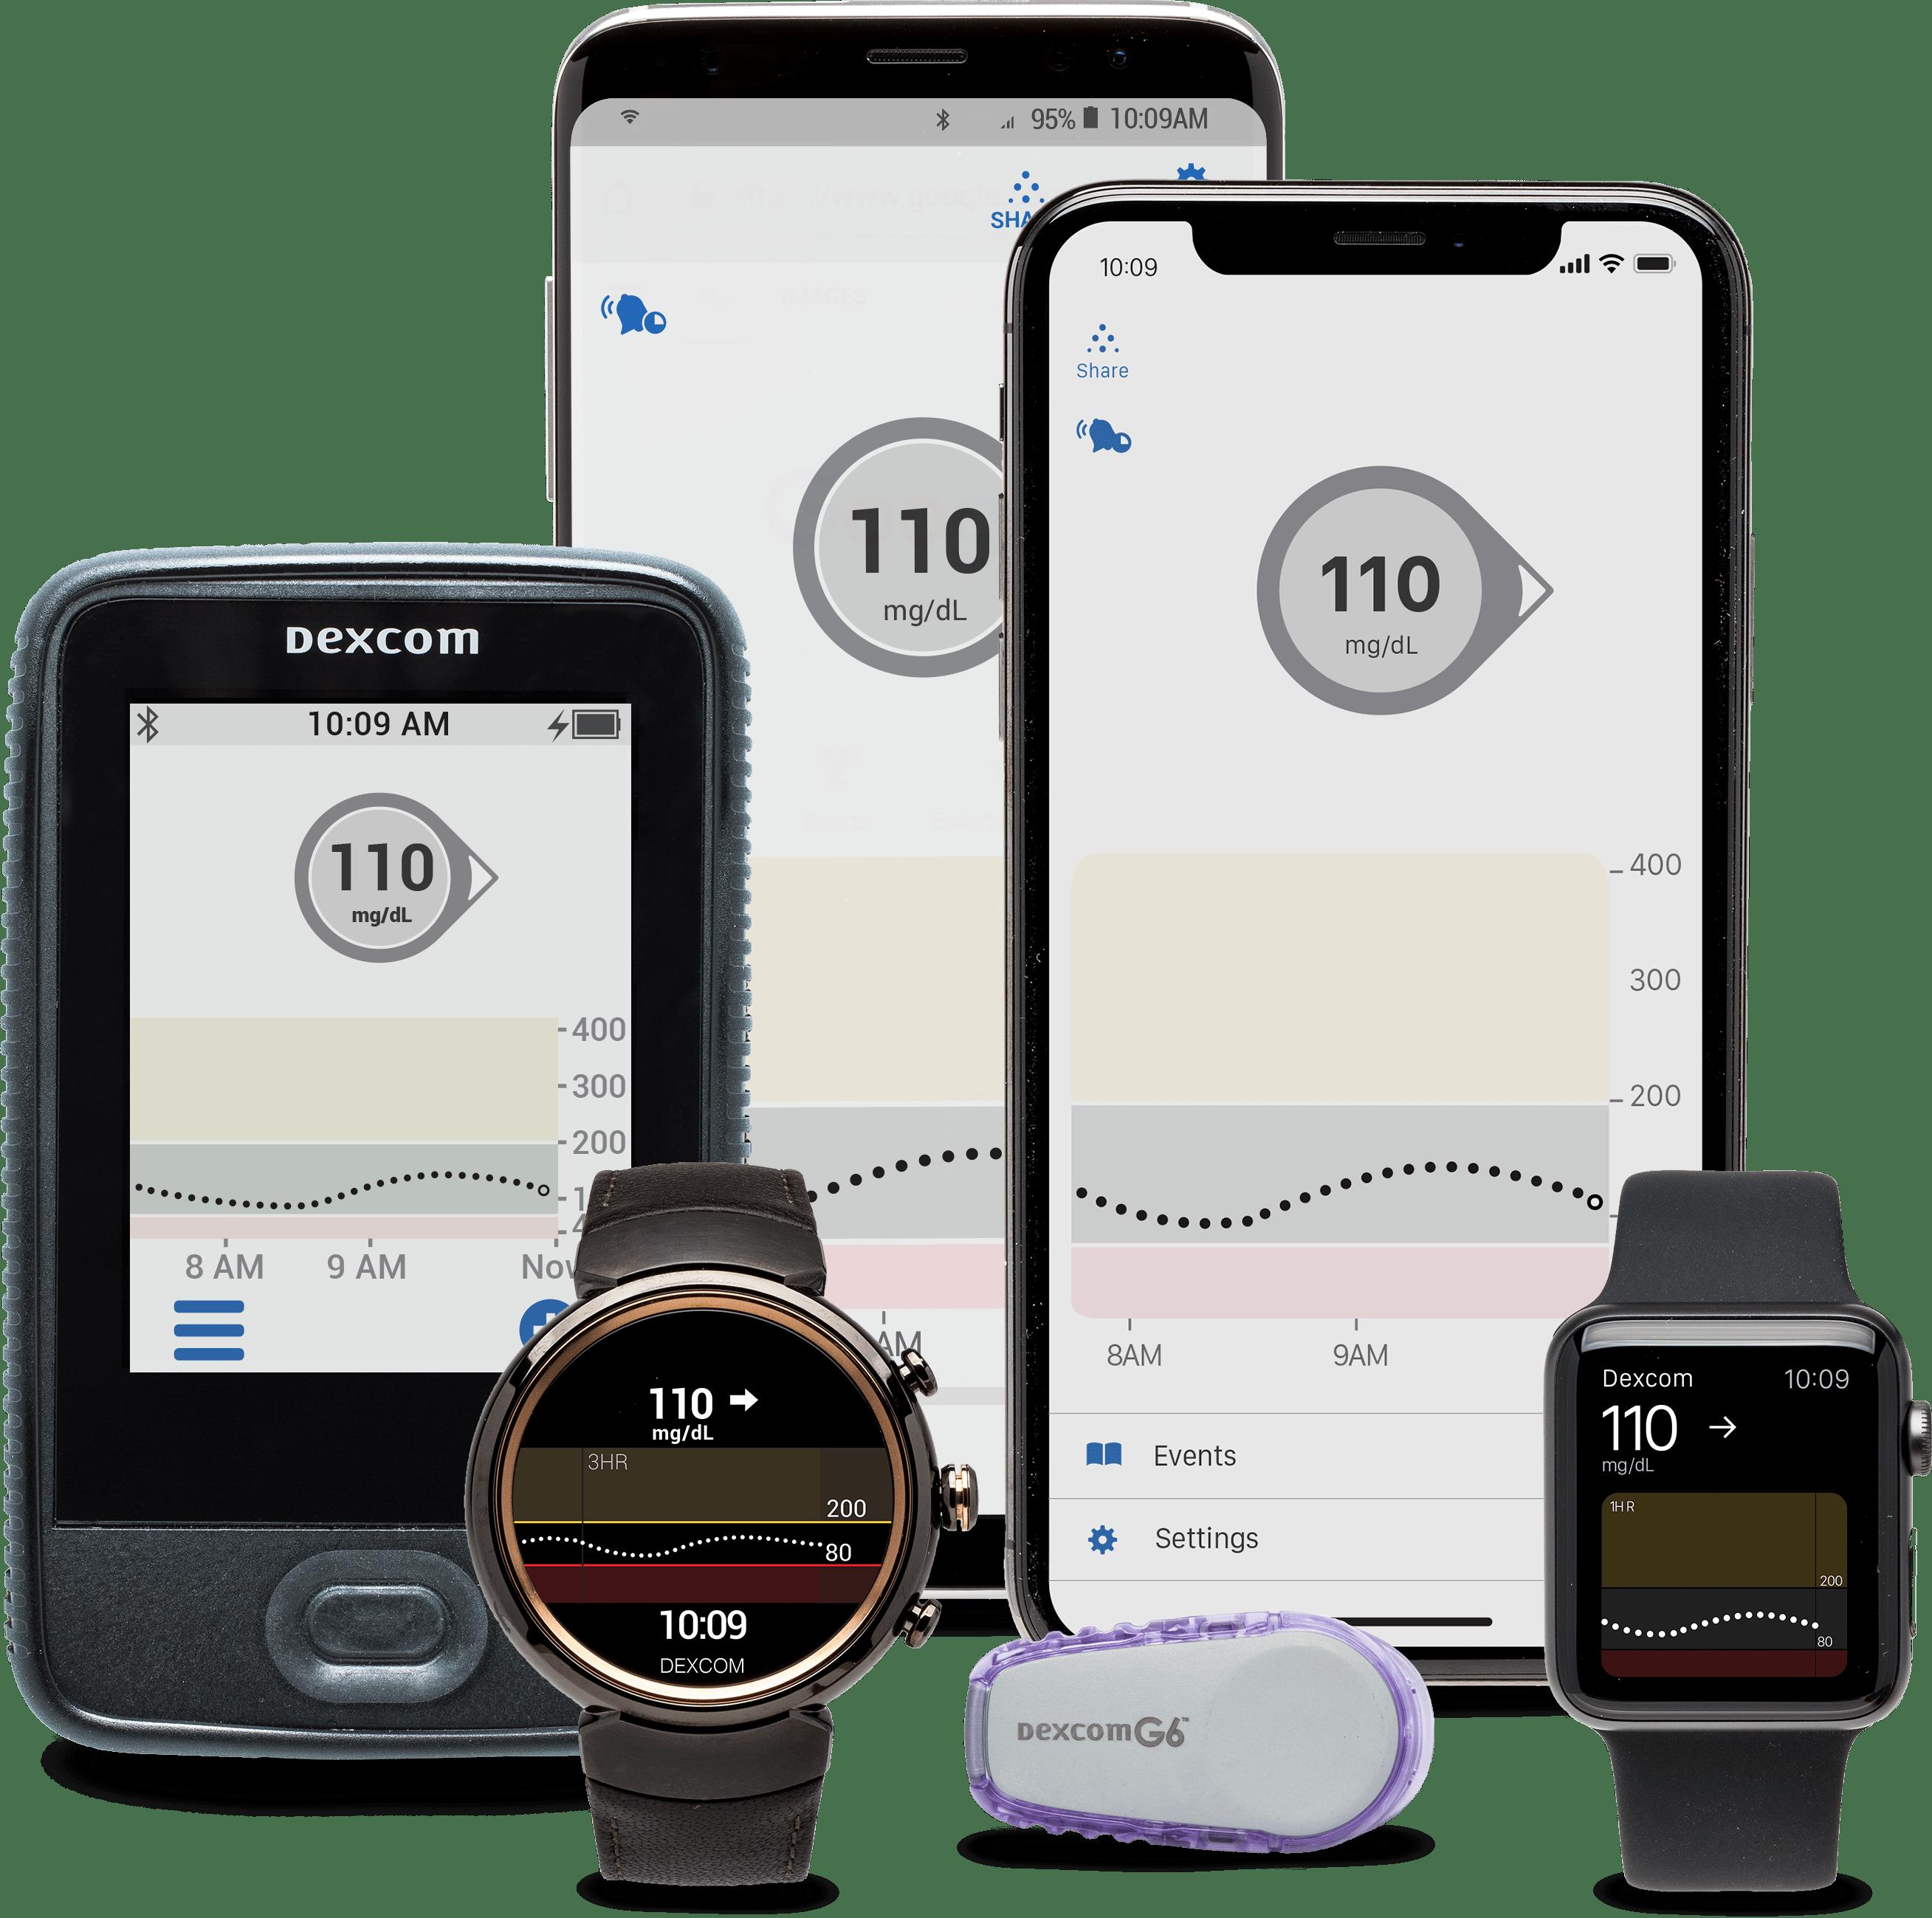 Dexcom glucose monitoring solutions